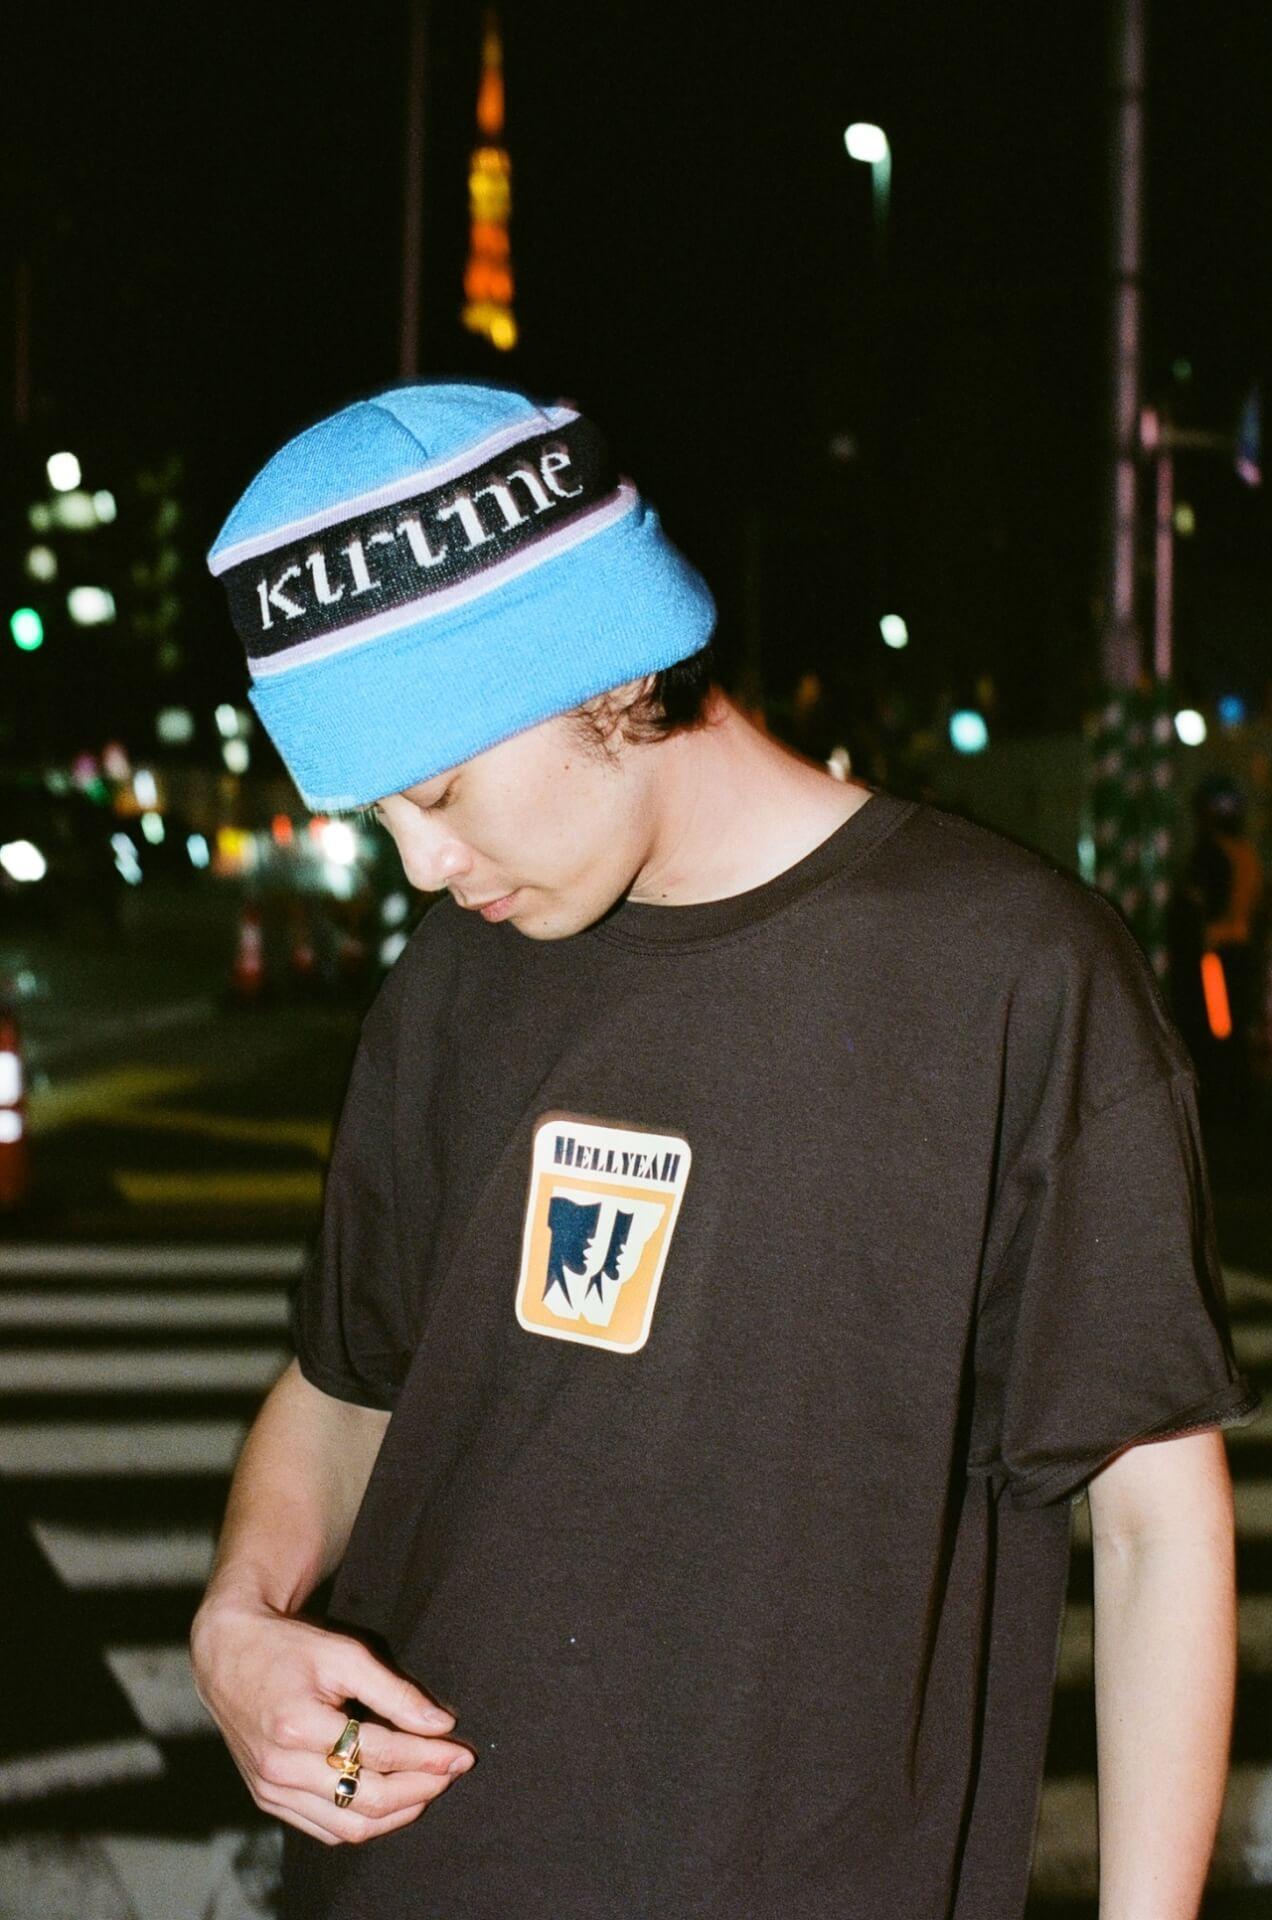 MEN YARD FIGHTなどでポップアップを行う「KIRIME」、次の展示は東急プラザ銀座にて life-fashion210424-kirime-9